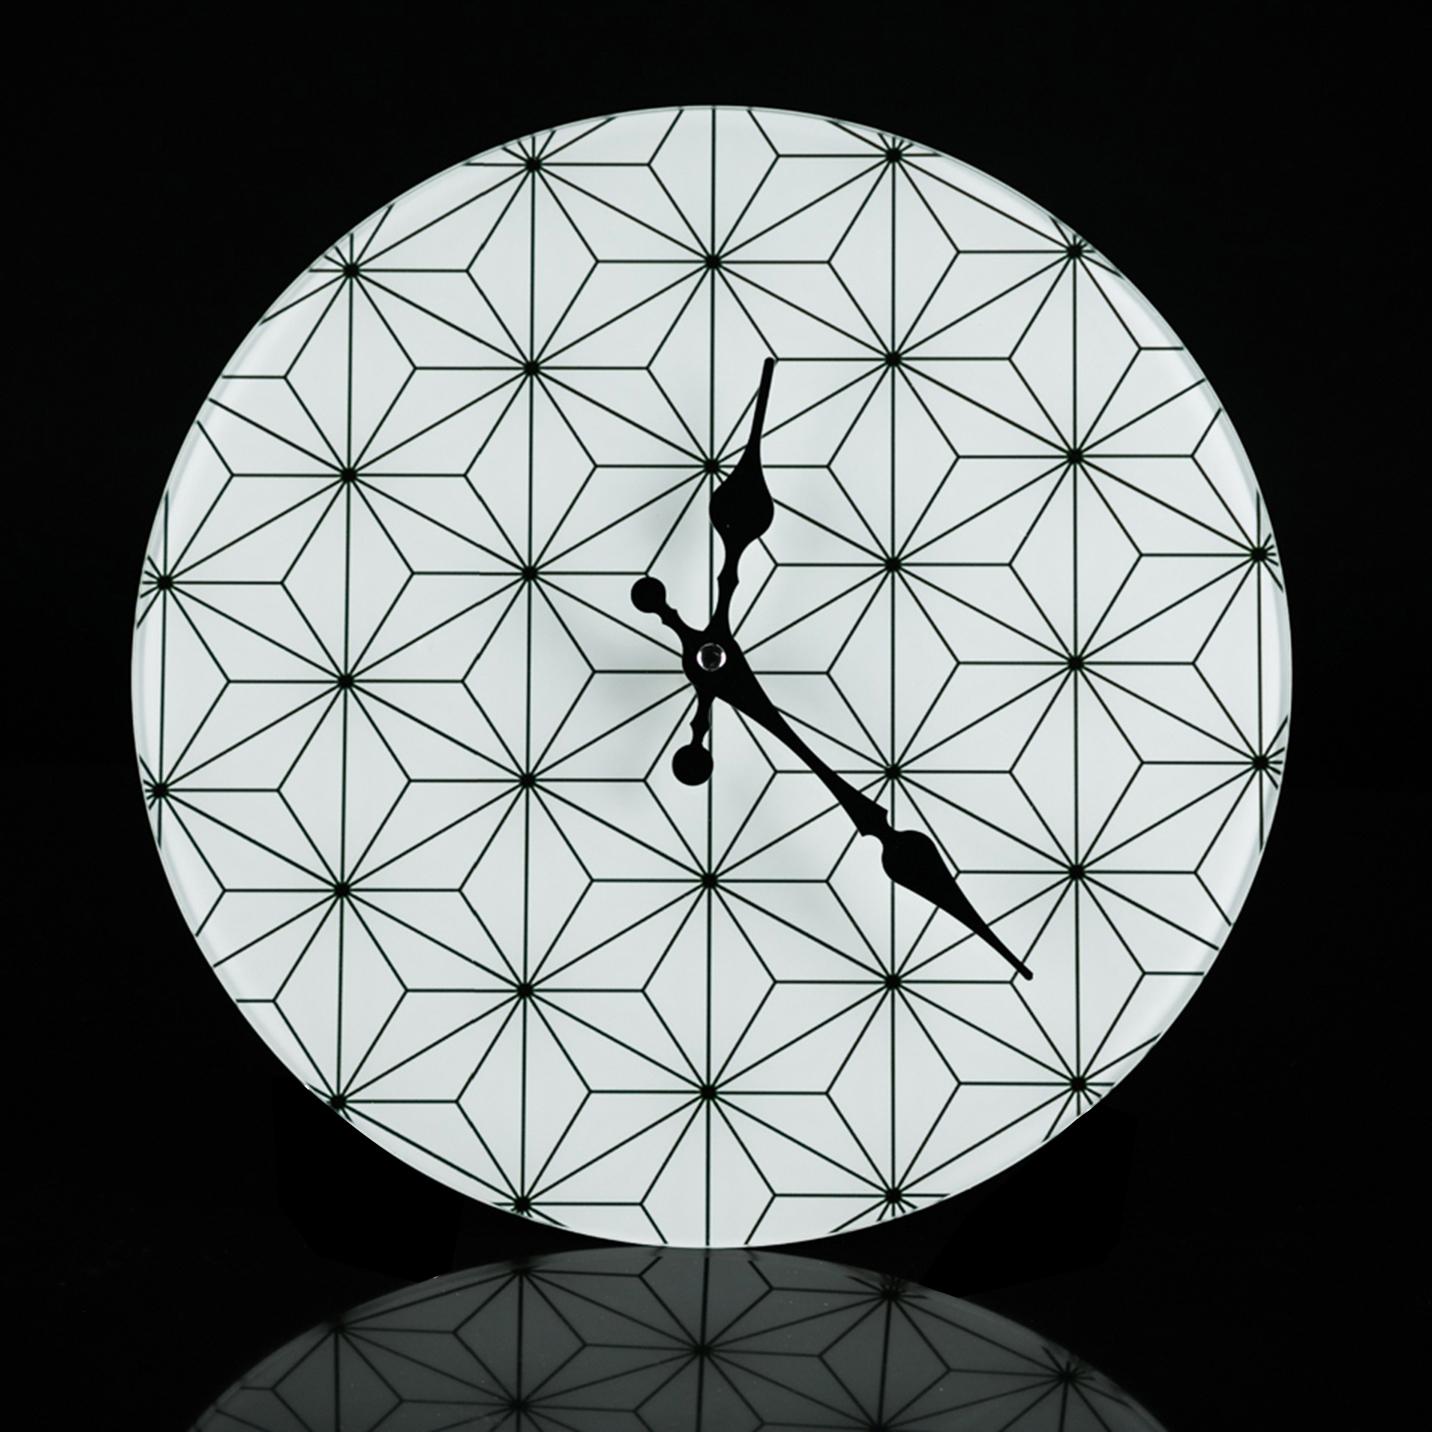 PRIM,CUSHY,FNOUTLET,Prim,Cushy,Fnoutlet,fnoutlet,RectangleShape,Glass,Clock,Modern,นาฬิกา,นาฬิกาติดผนัง,กระจก,ติดผนัง,ตกแต่งบ้าน,ห้องนั่งเล่น,เวลา,นาฬิกาข้อมือ